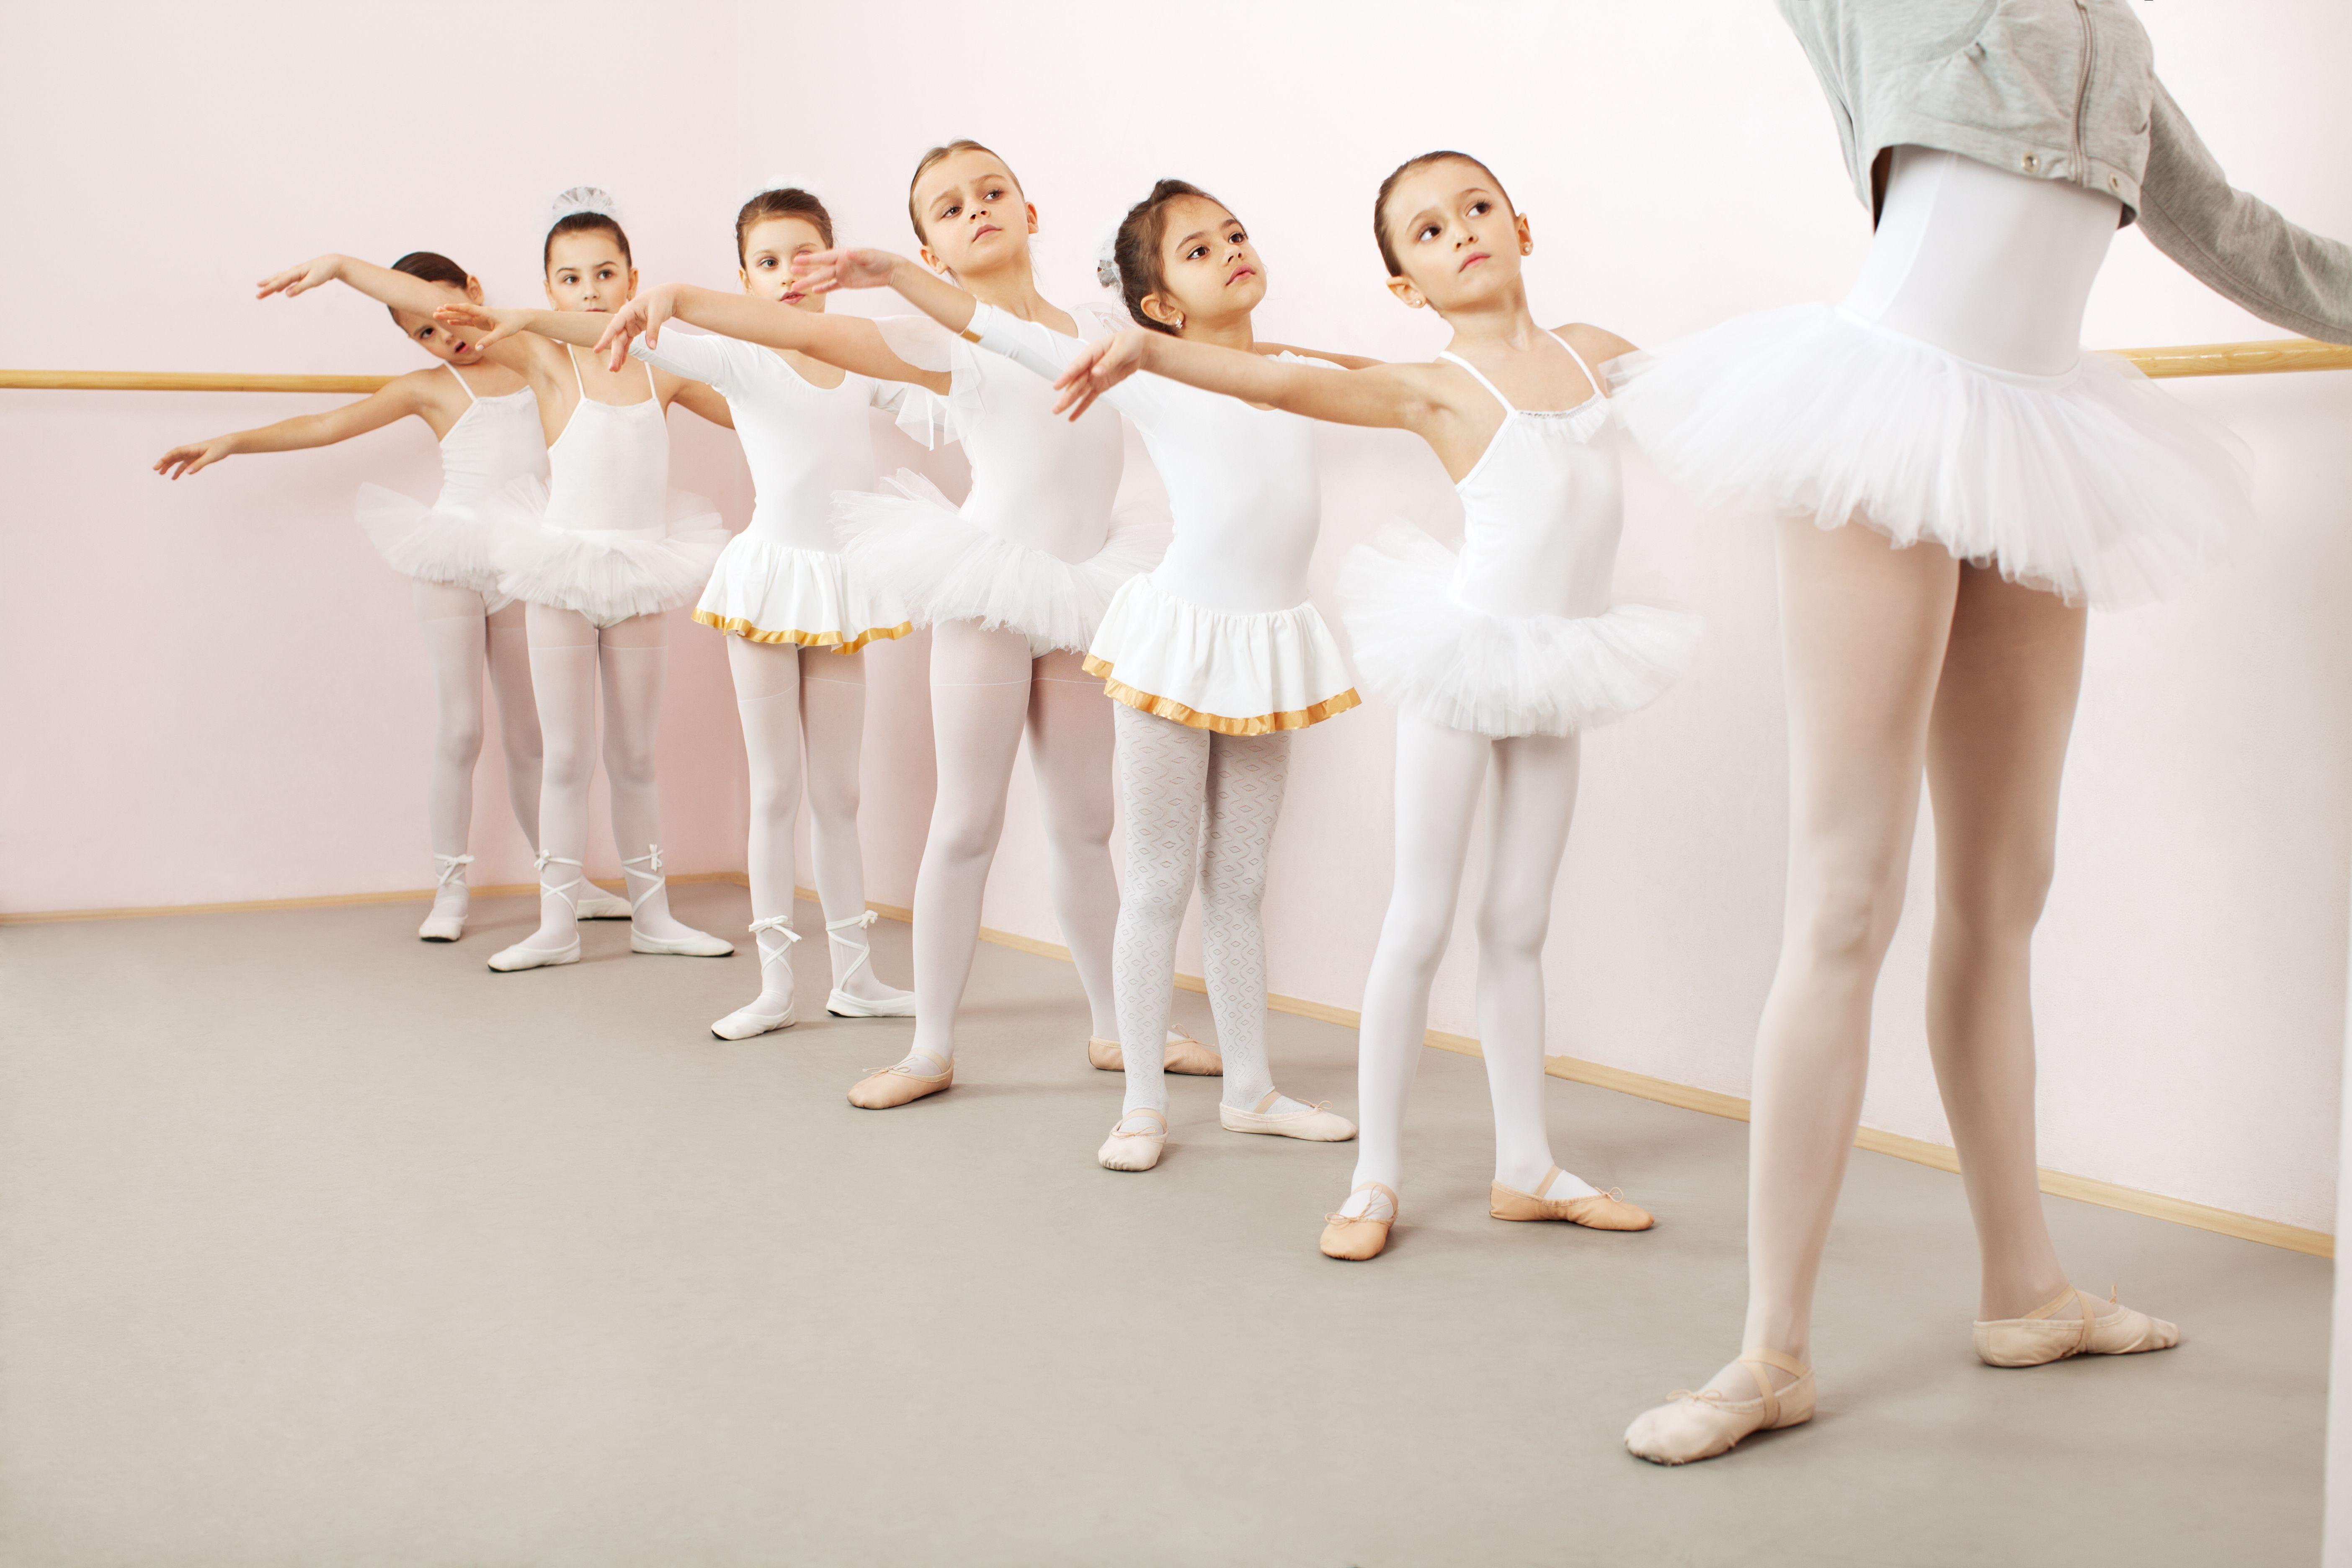 Carmen Variation Dance Outfits Dance Outfits Ballet Ballet Clothes